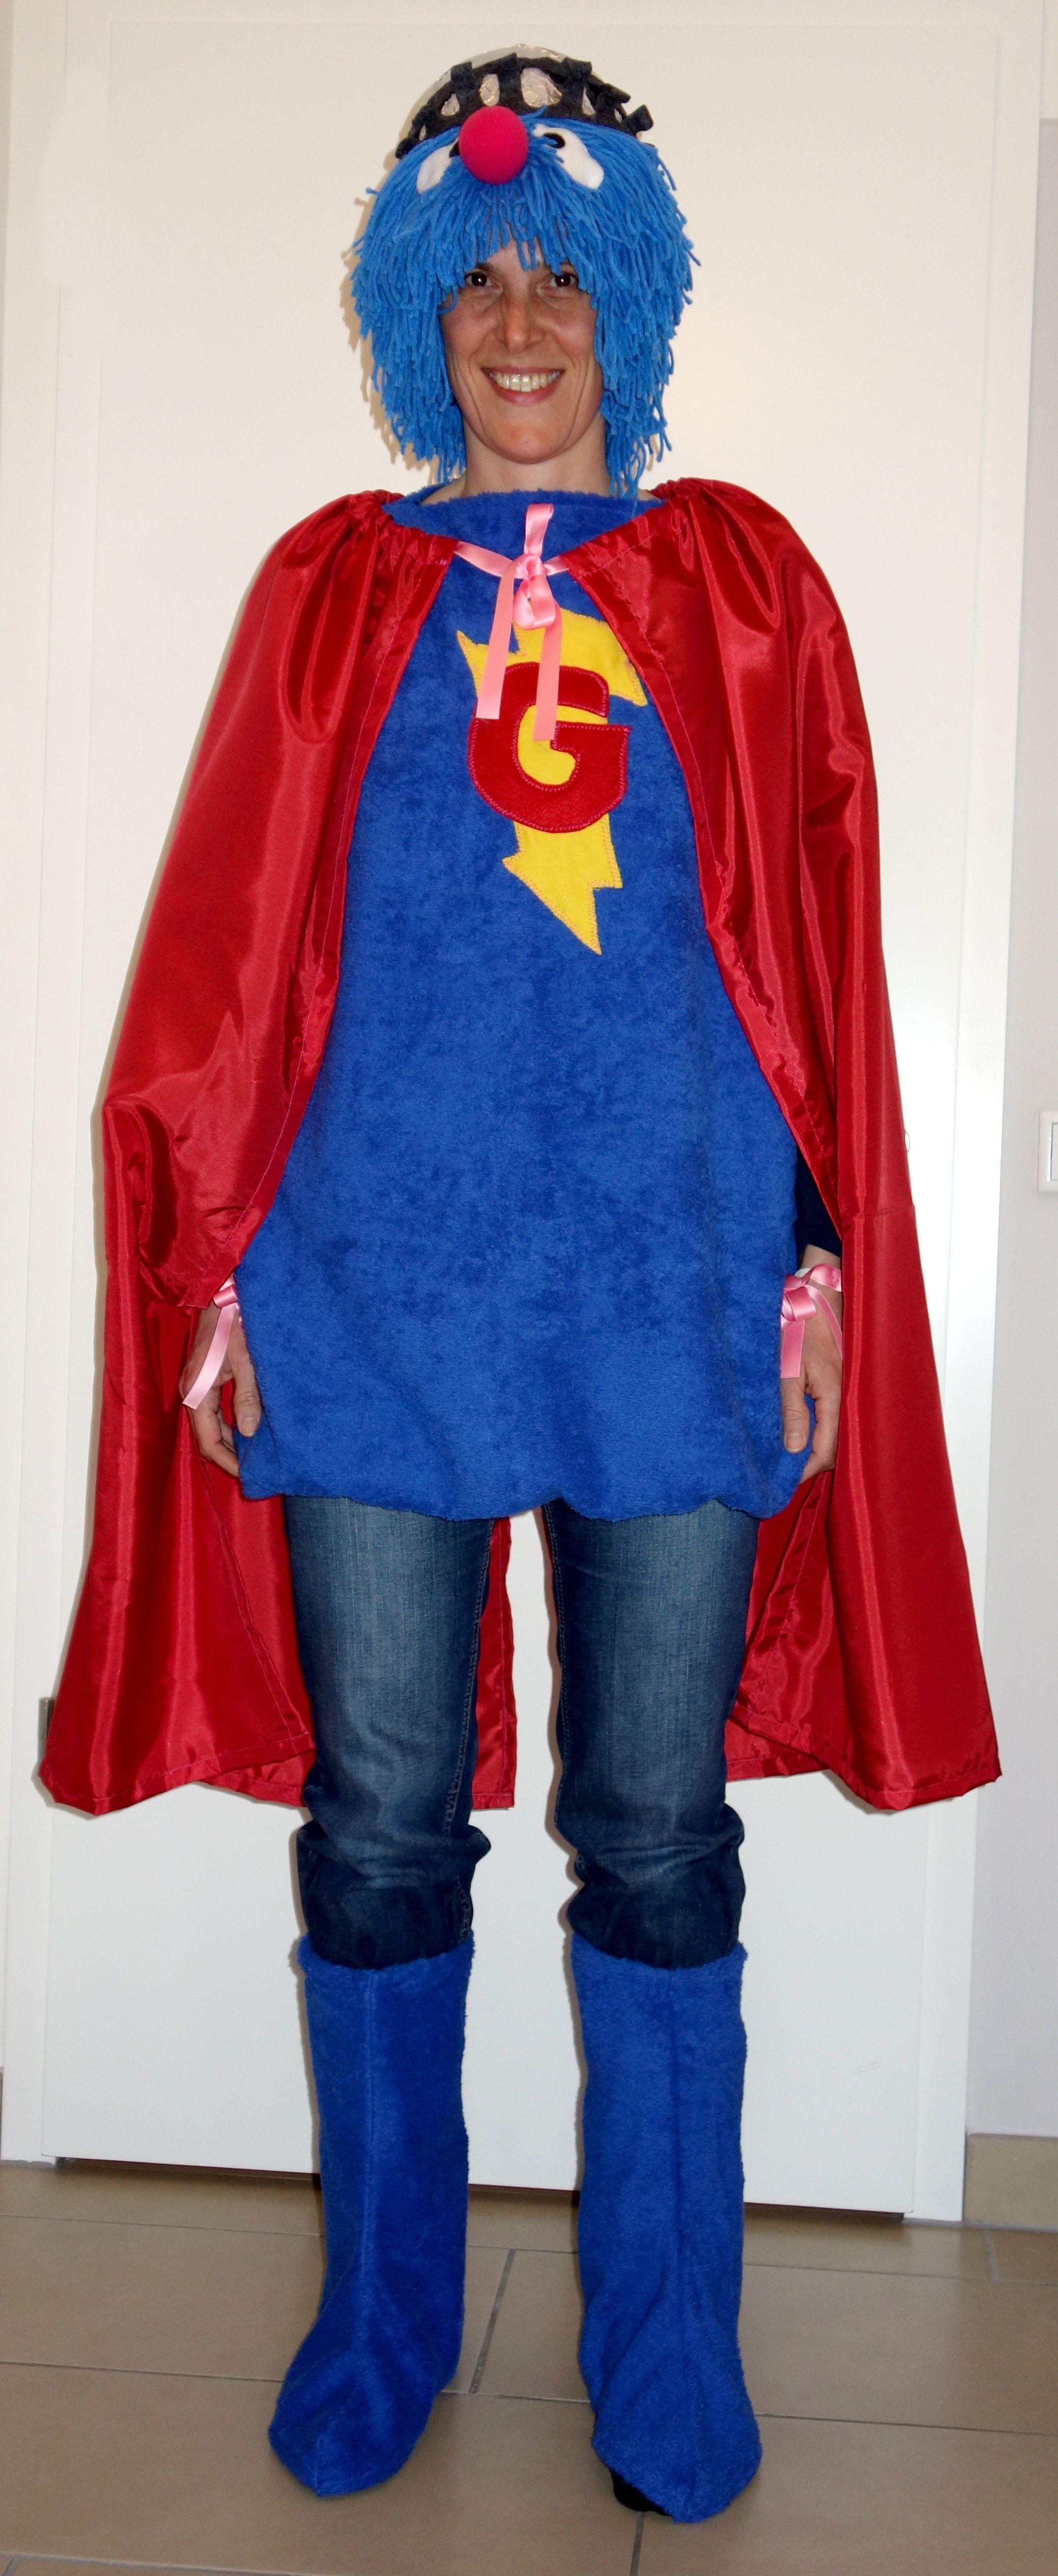 Super- Grobi Kostüm 2017 | Sesamstrasse | Pinterest | Super und Kostüm